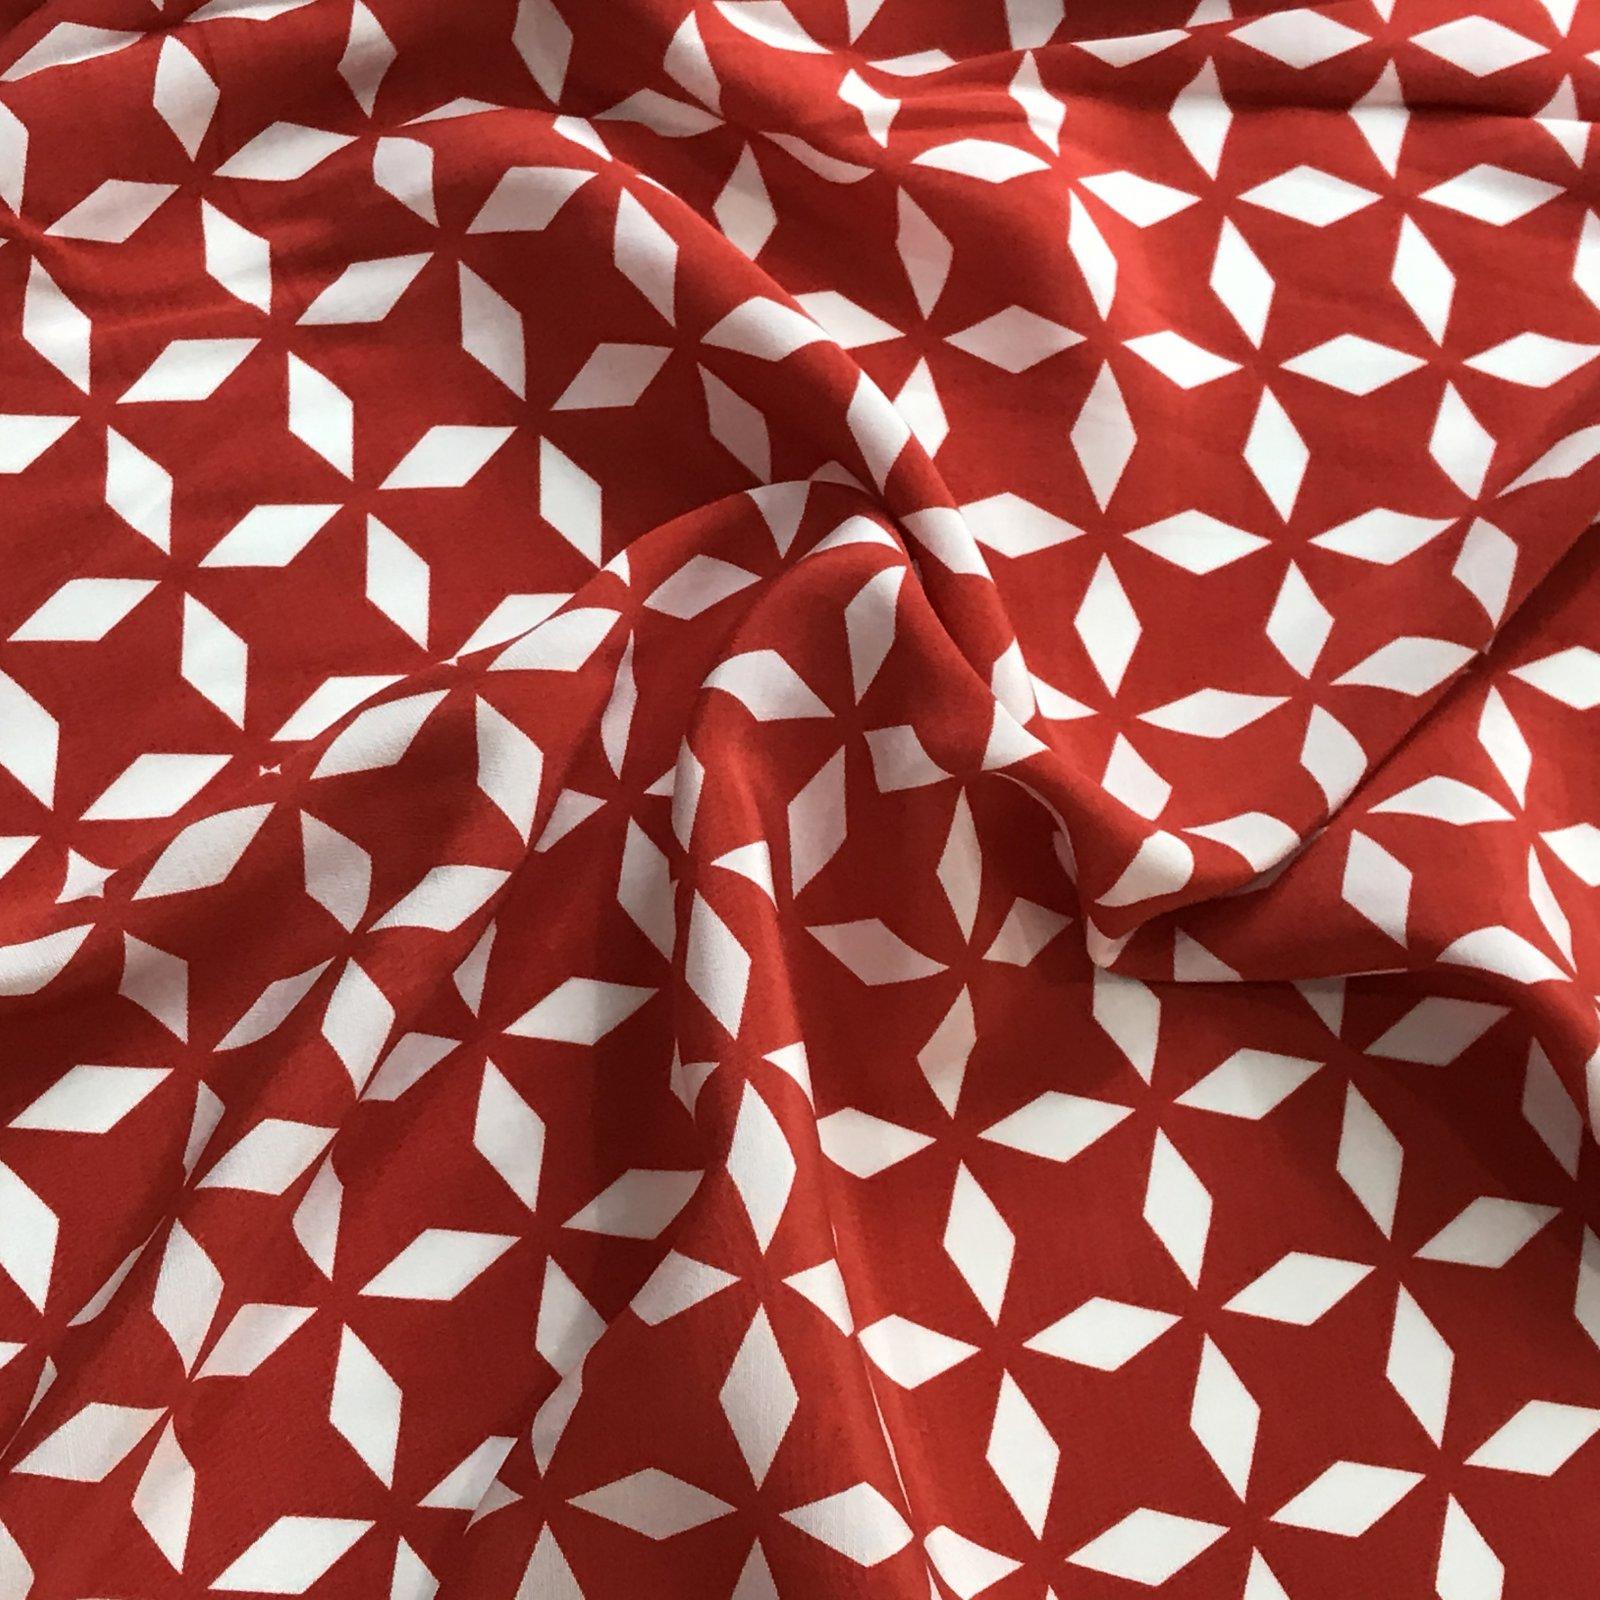 Rayon - Red & White Geometric